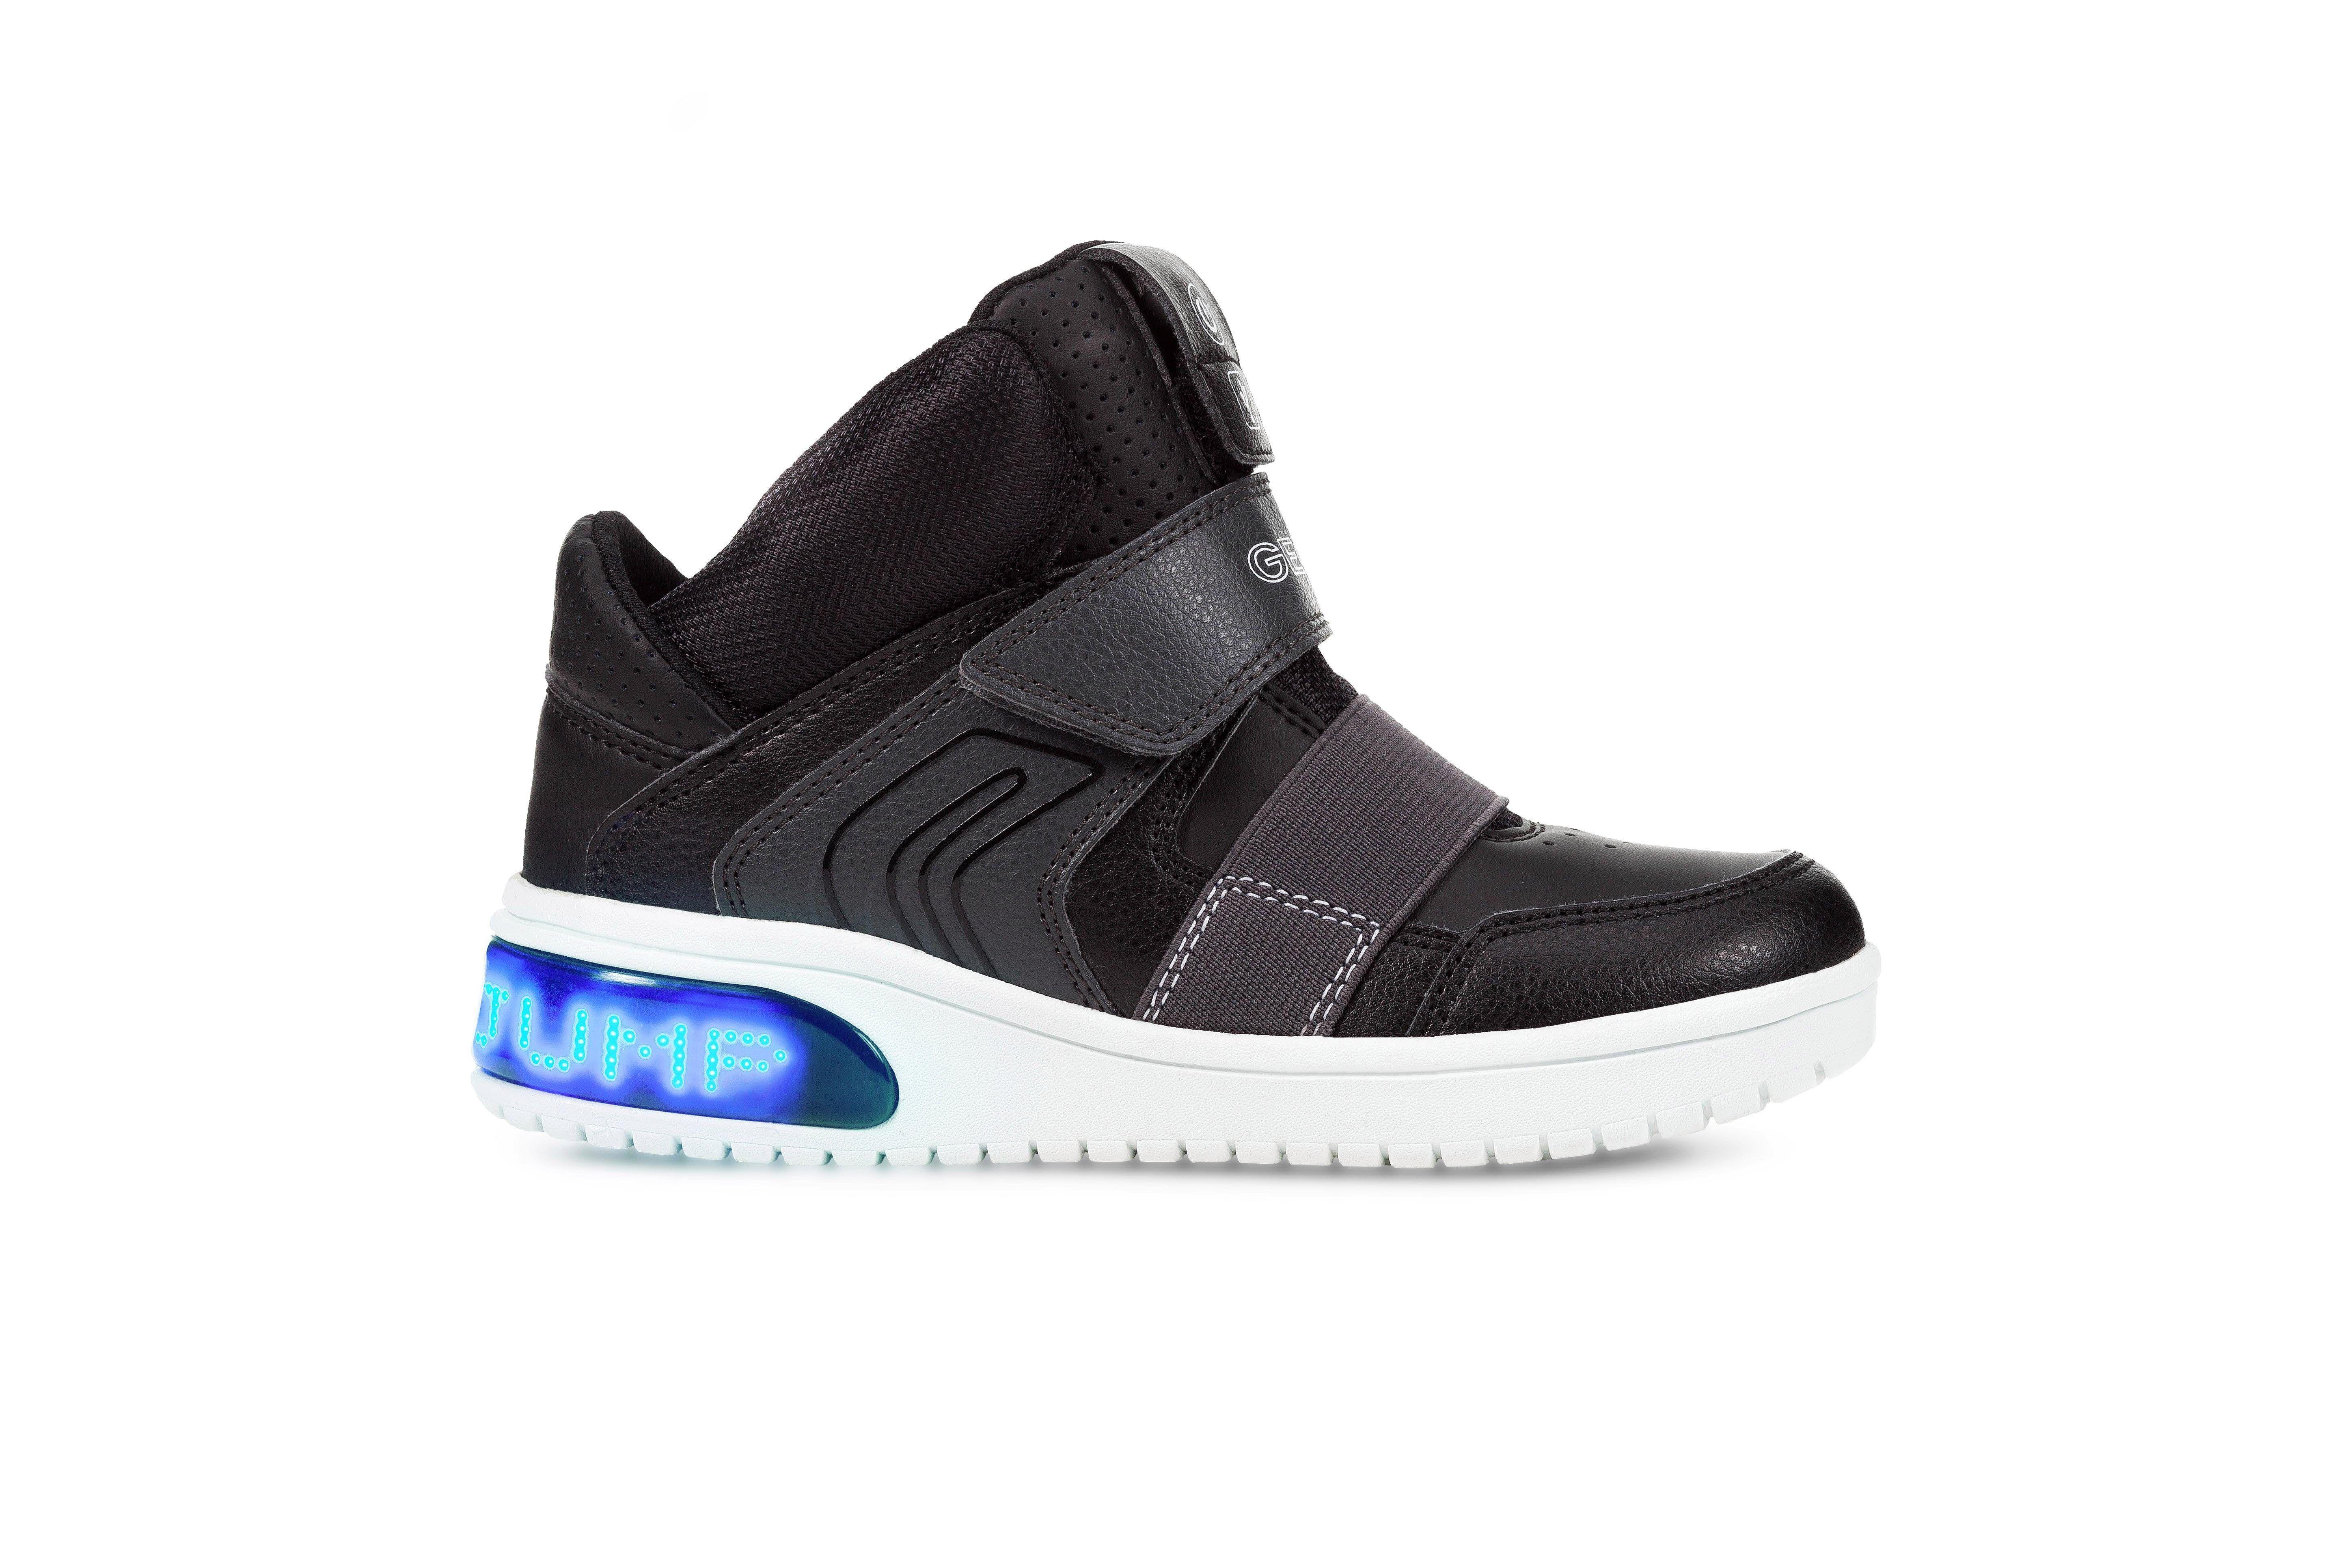 3e47a01624b629 JungenKinderKinderKinderJungen Geox Kids XLed Boy Sneaker mit cooler  Blinkfunktion via App-Steuerung schwarz